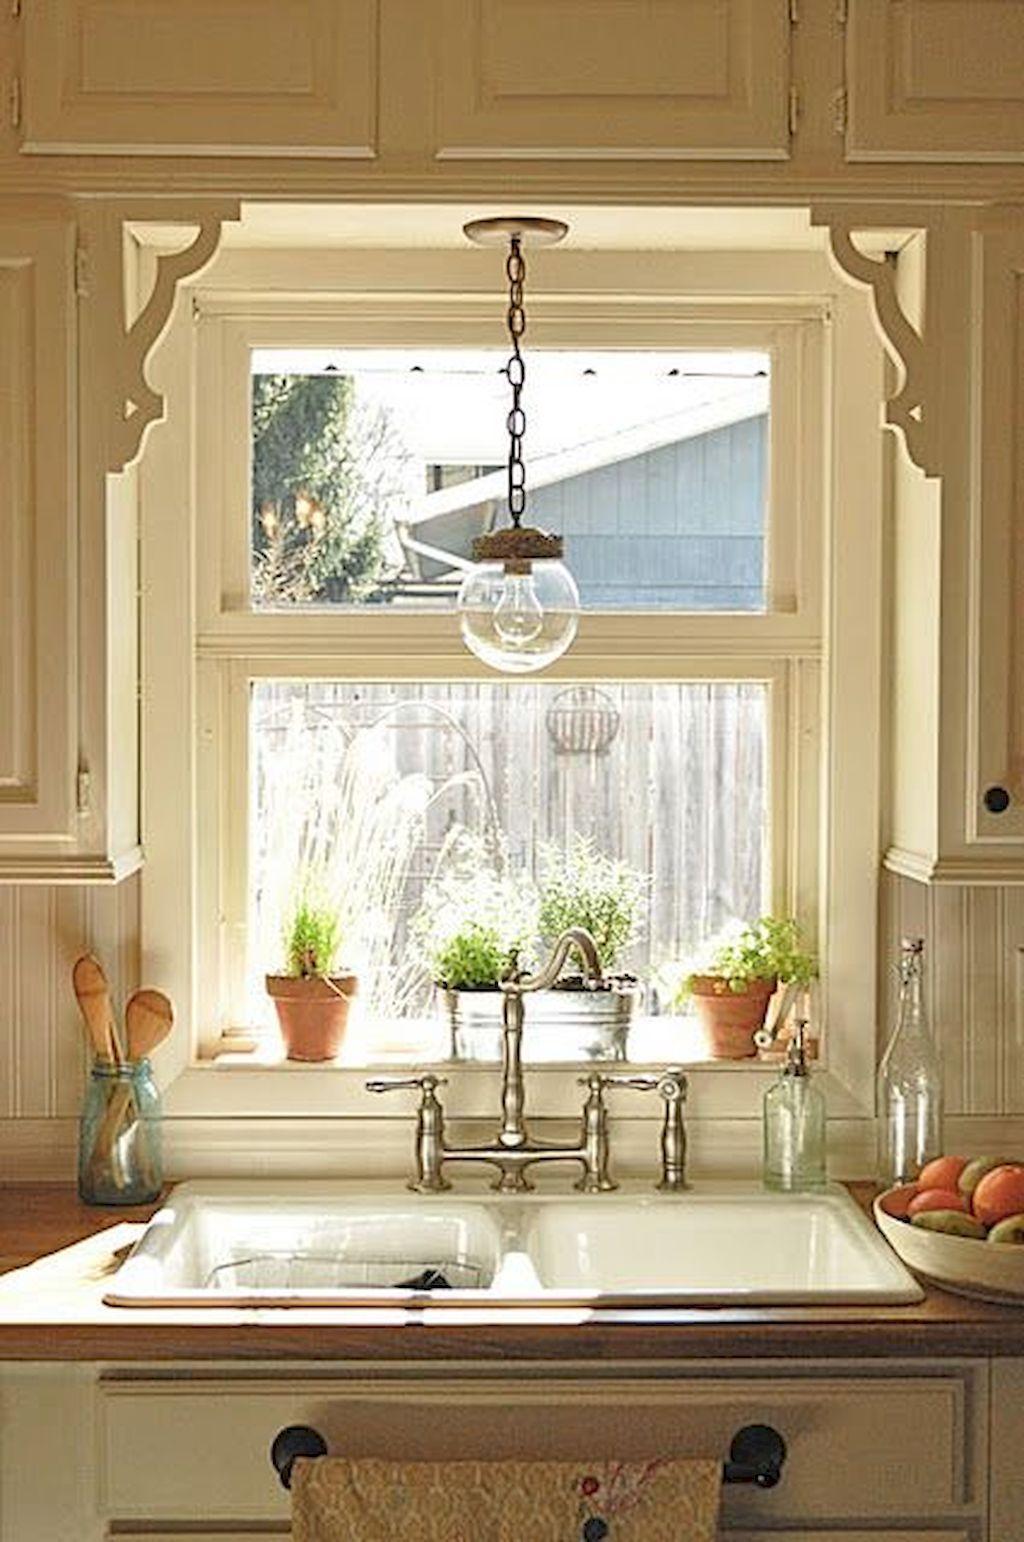 70 Rustic Kitchen Sink Farmhouse Style Ideas